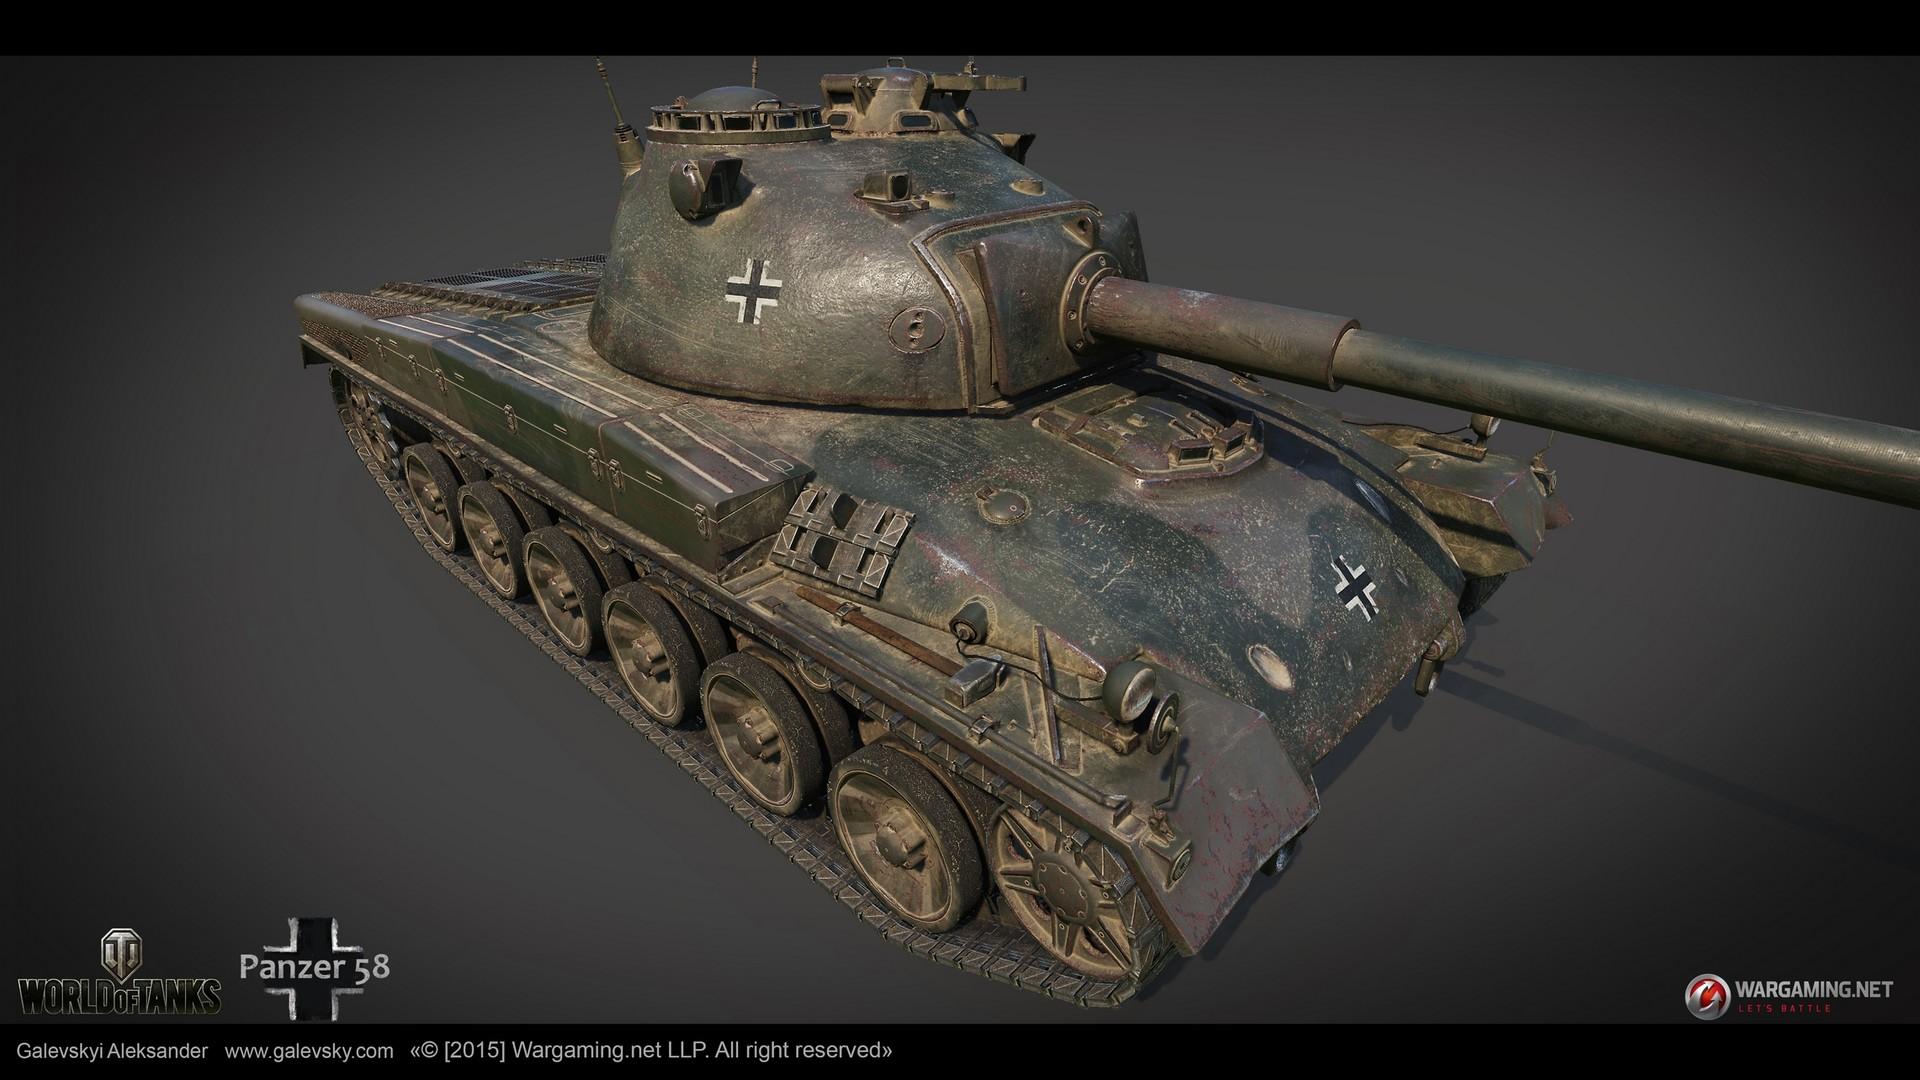 Aleksander galevskyi panzer 58 05 med